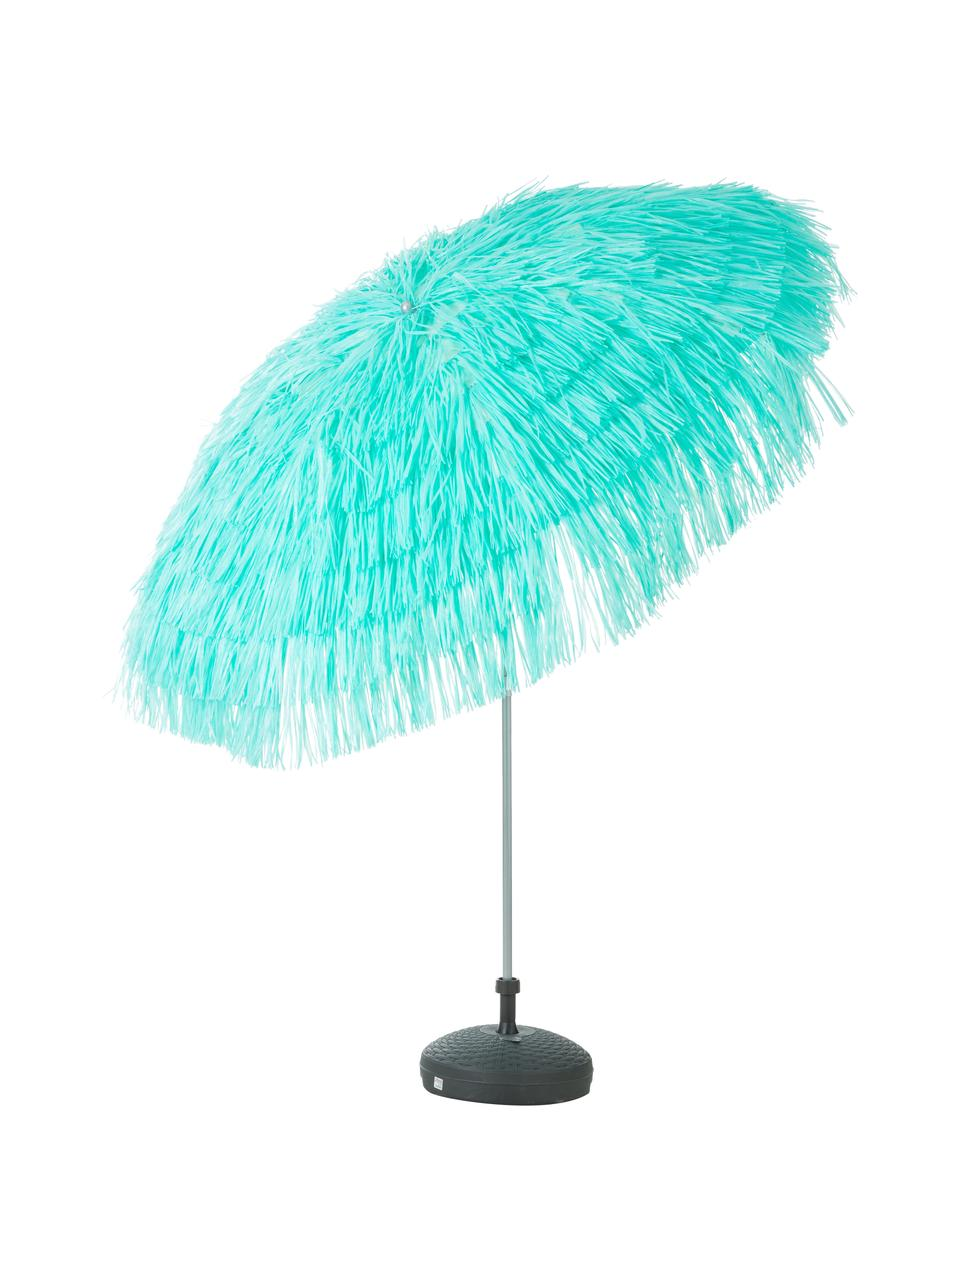 Parasol Hawaii, Turquoise